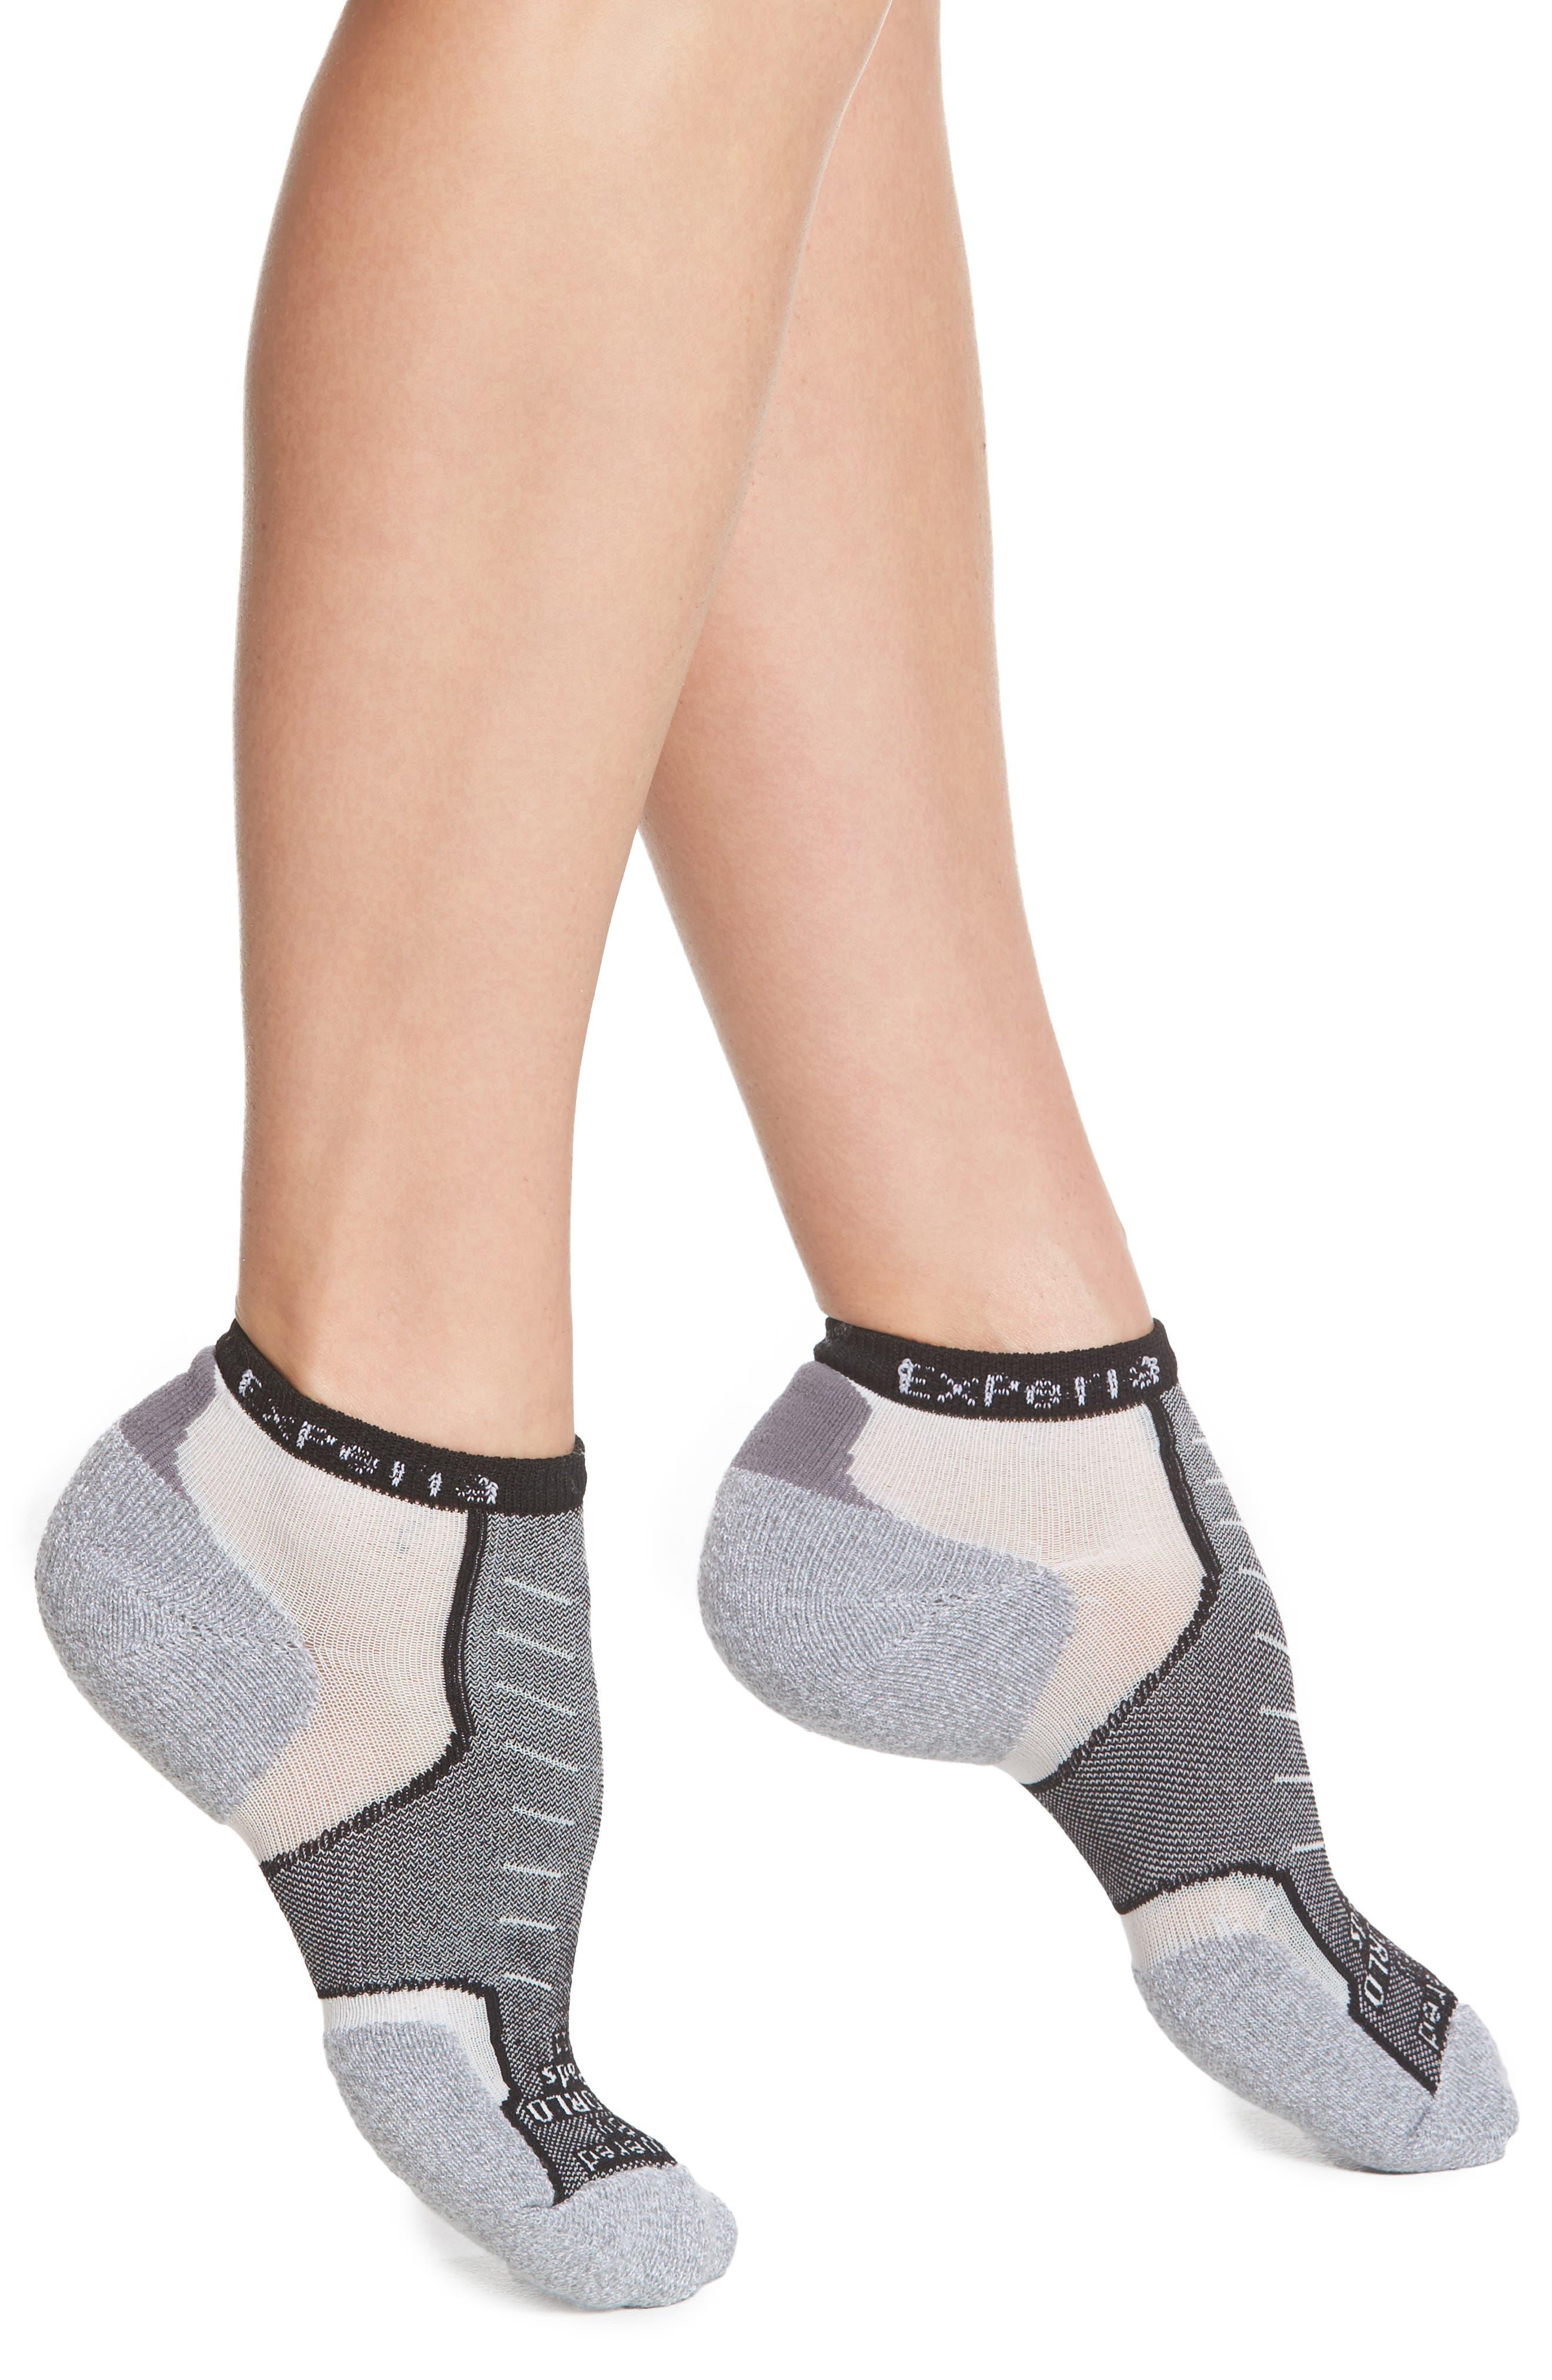 Thorlo Experia® Thin Cushion Performance Socks